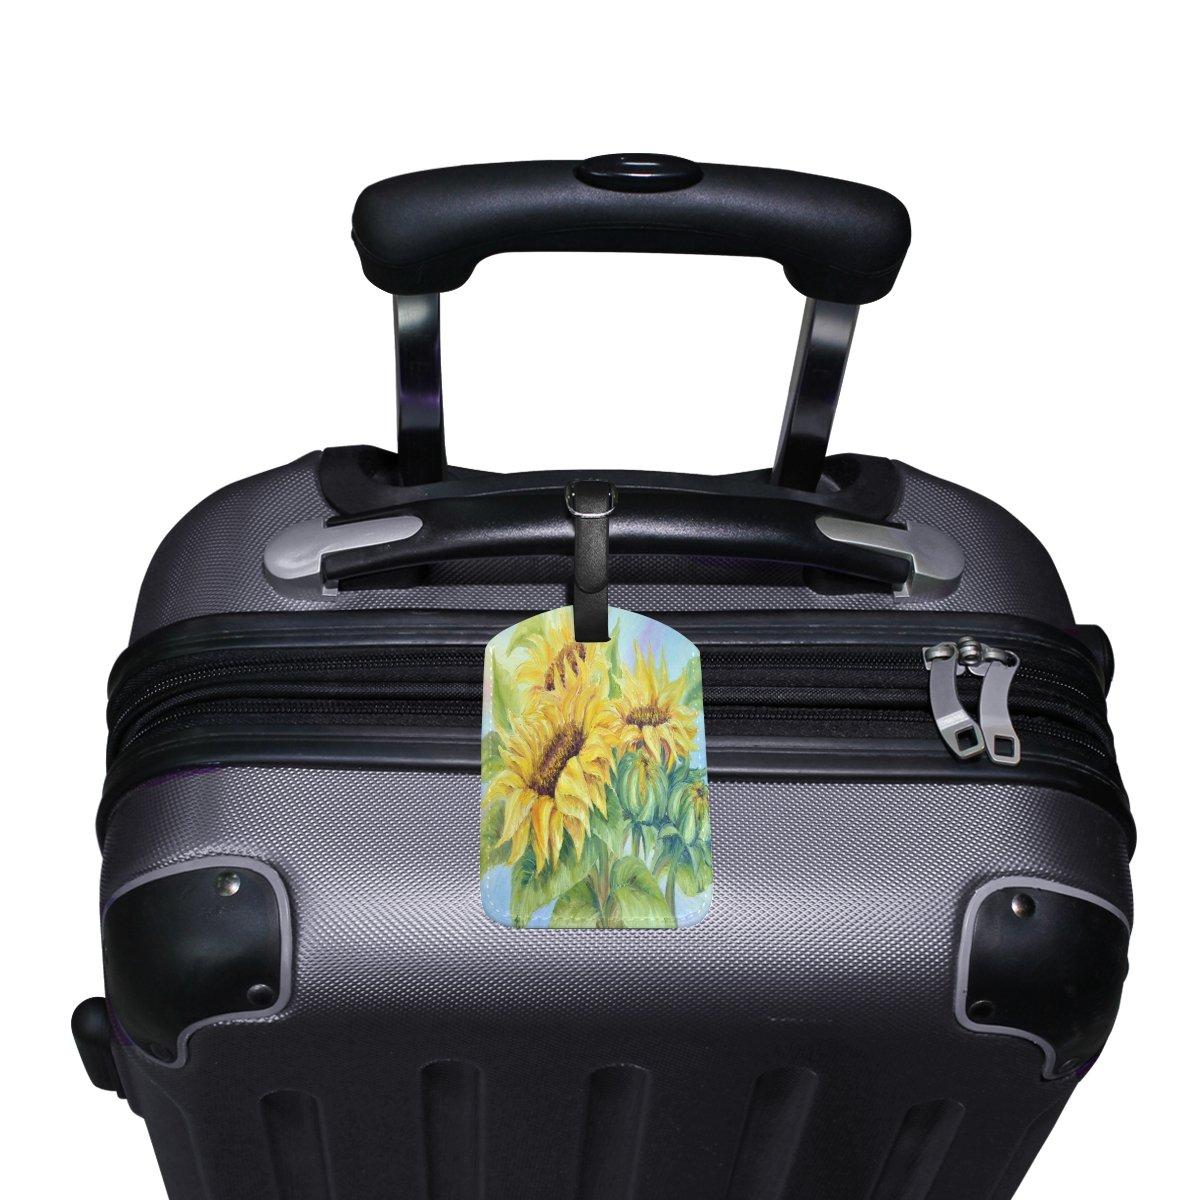 1Pcs Saobao Travel Luggage Tag Sunflower PU Leather Baggage Suitcase Travel ID Bag Tag